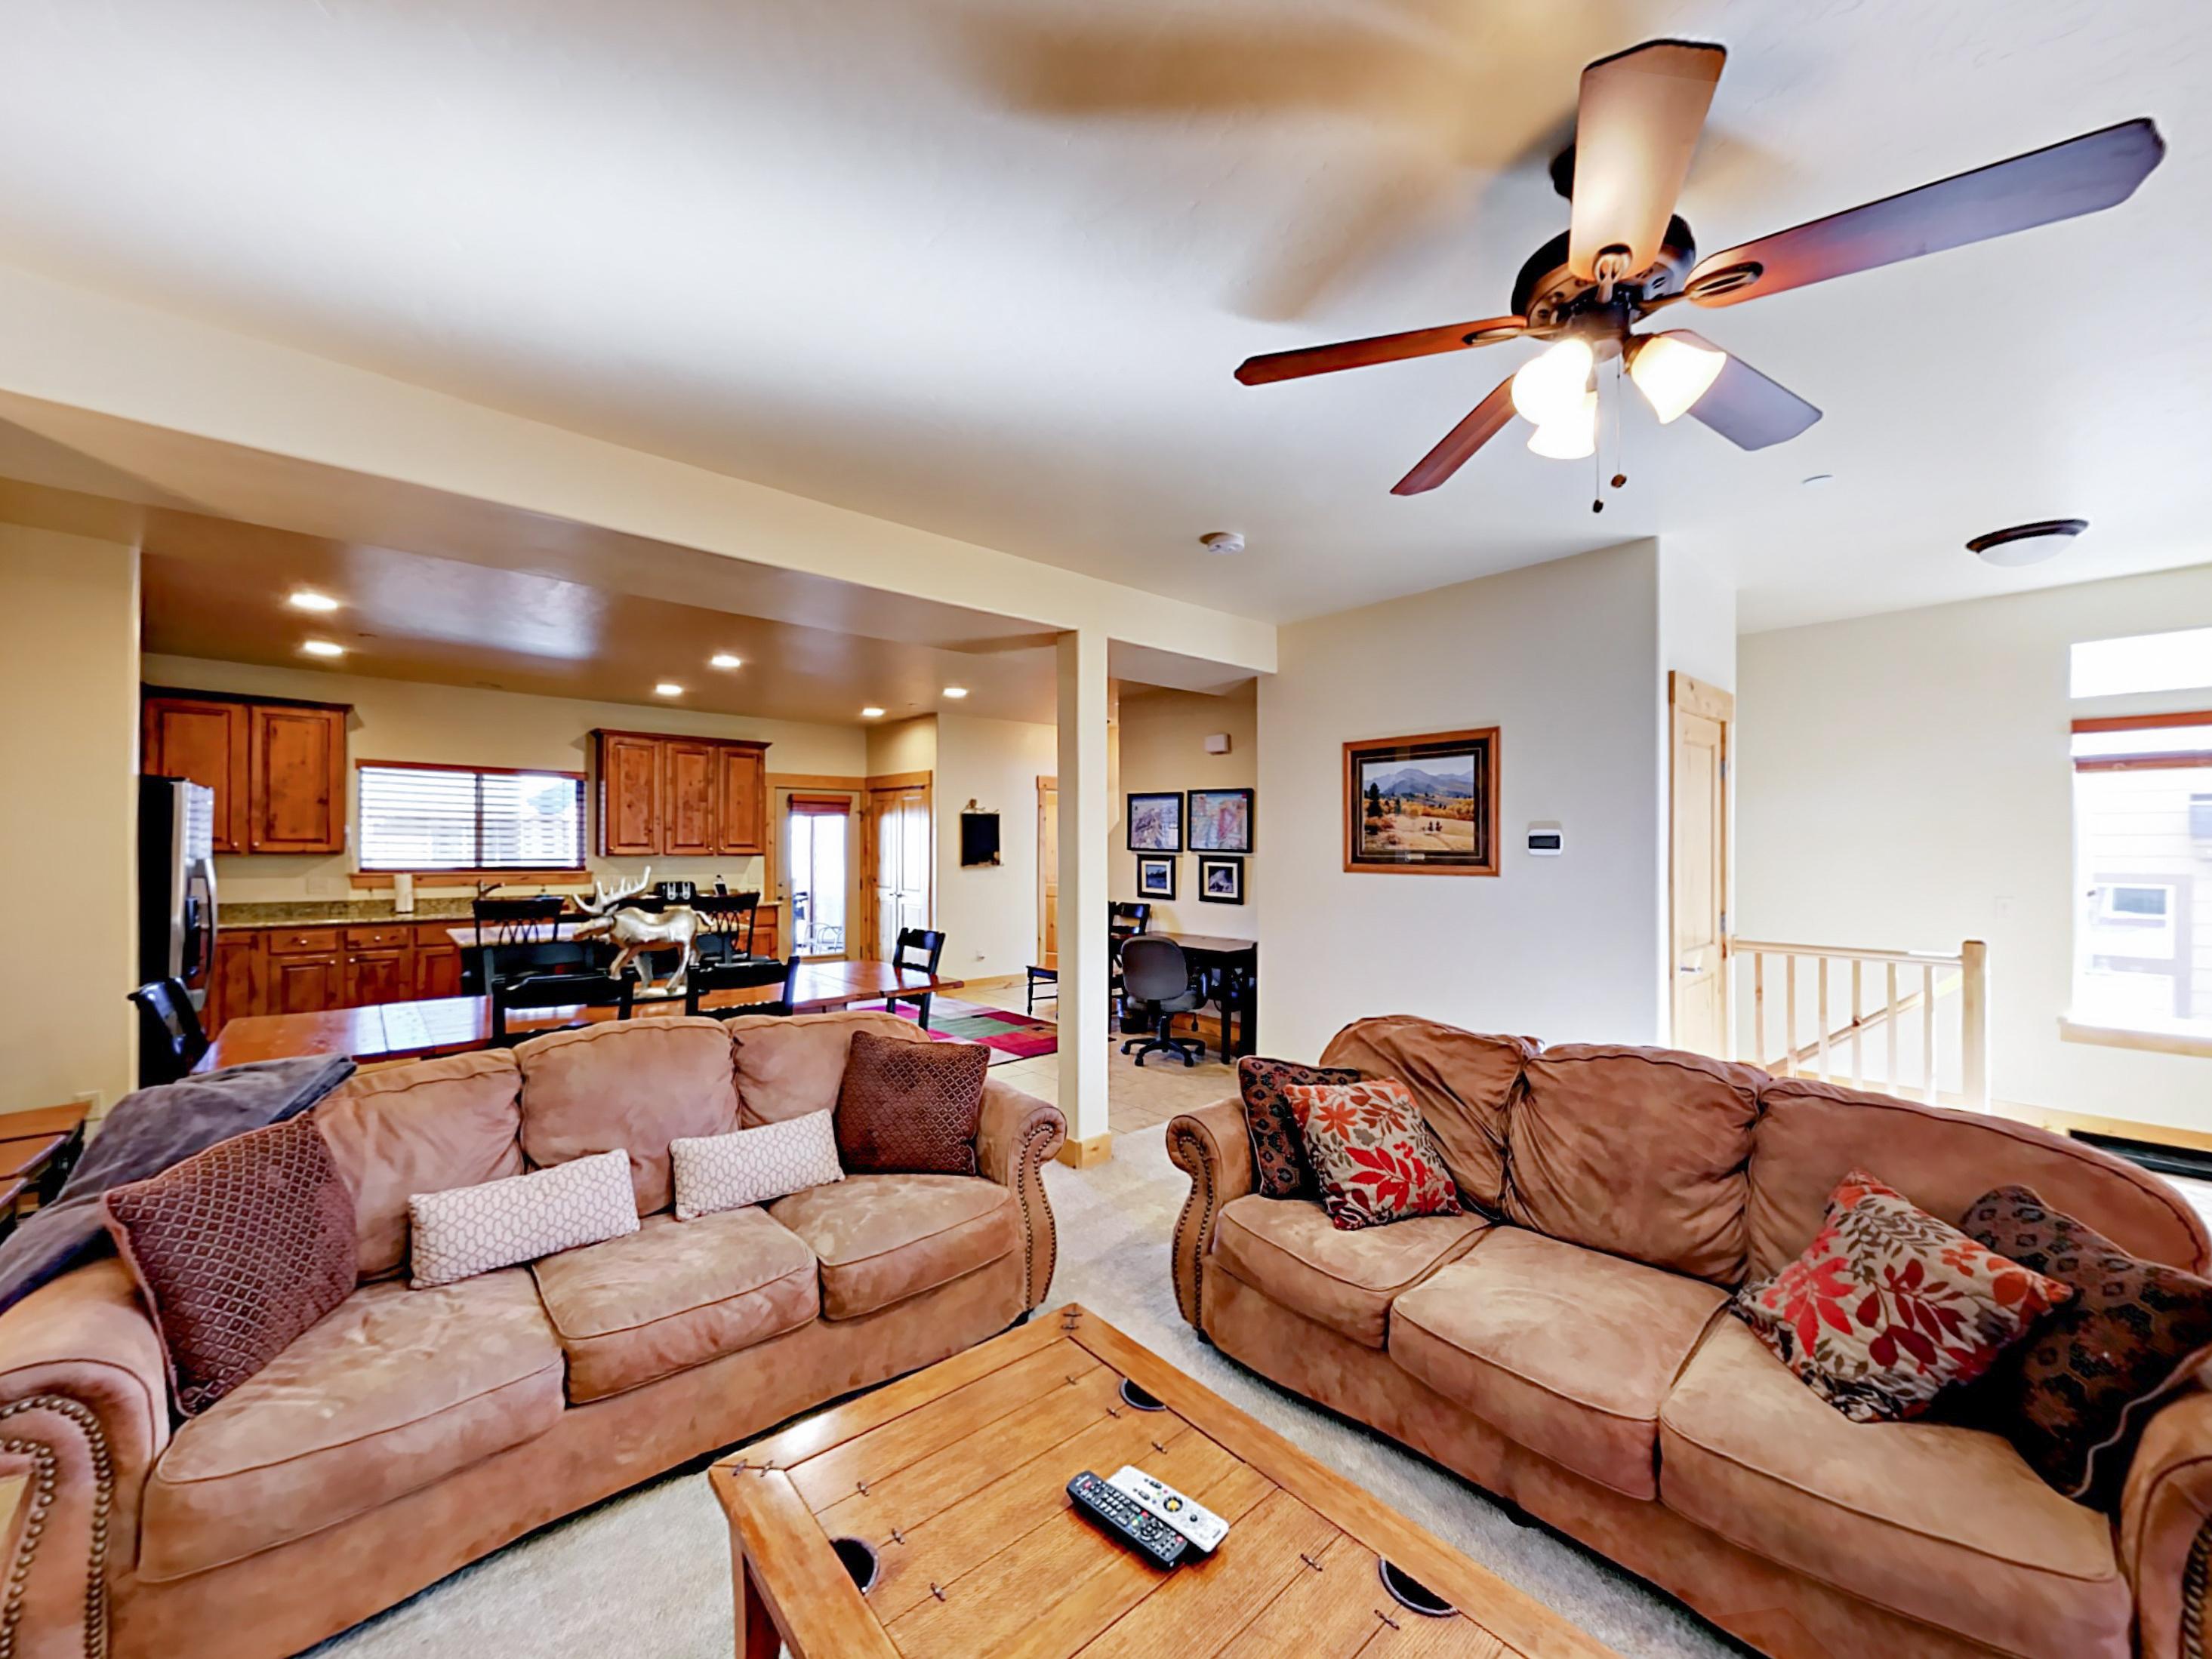 Park City UT Vacation Rental The living room